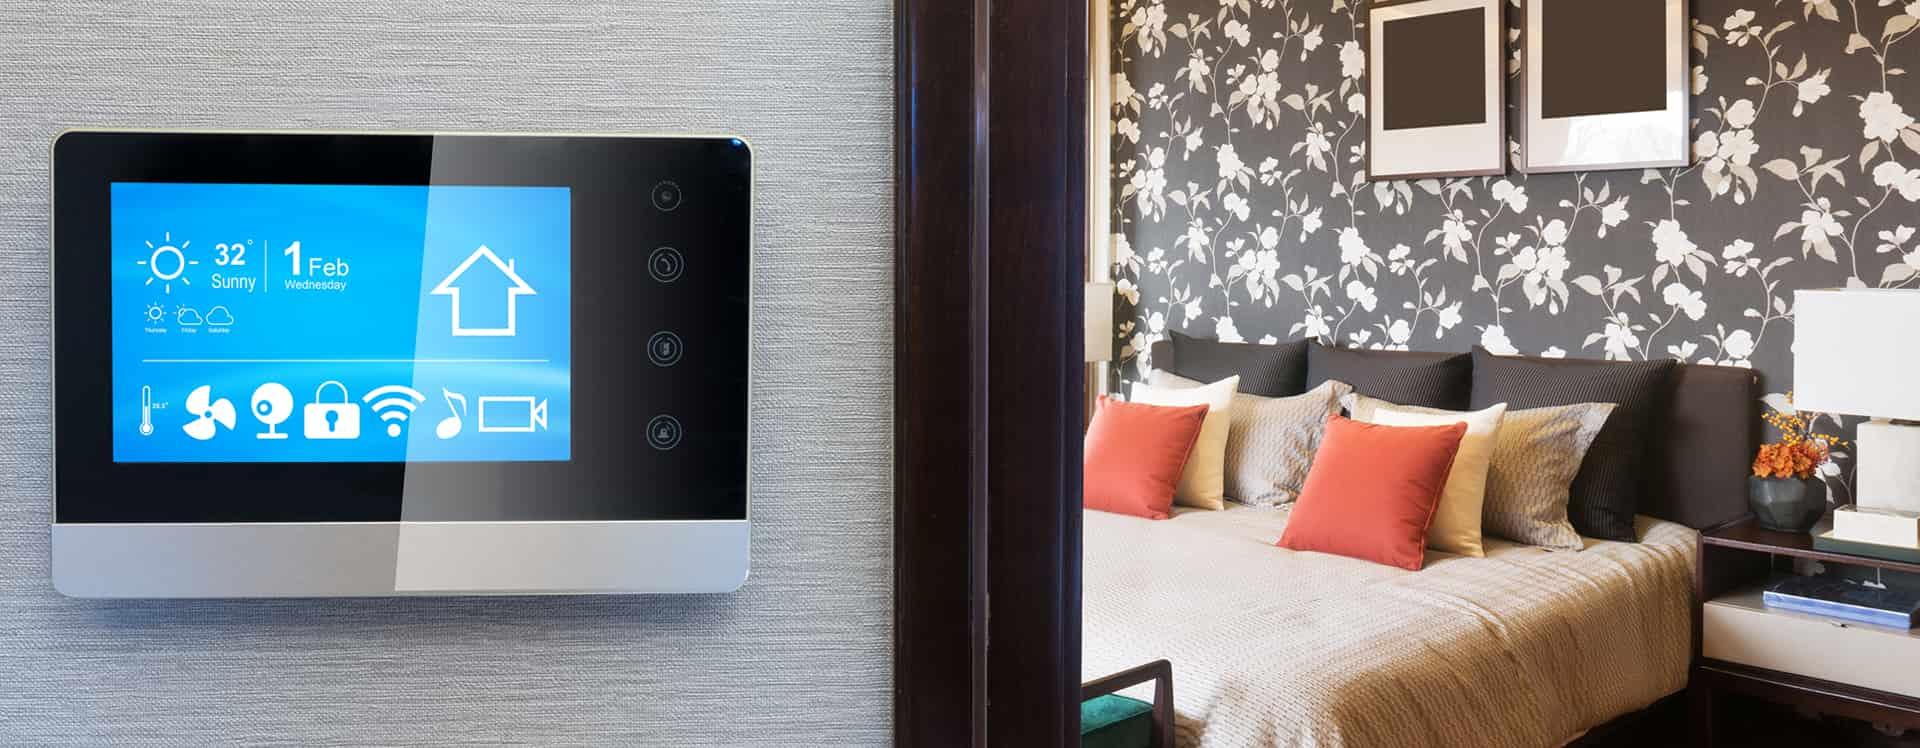 Smart Home Controls